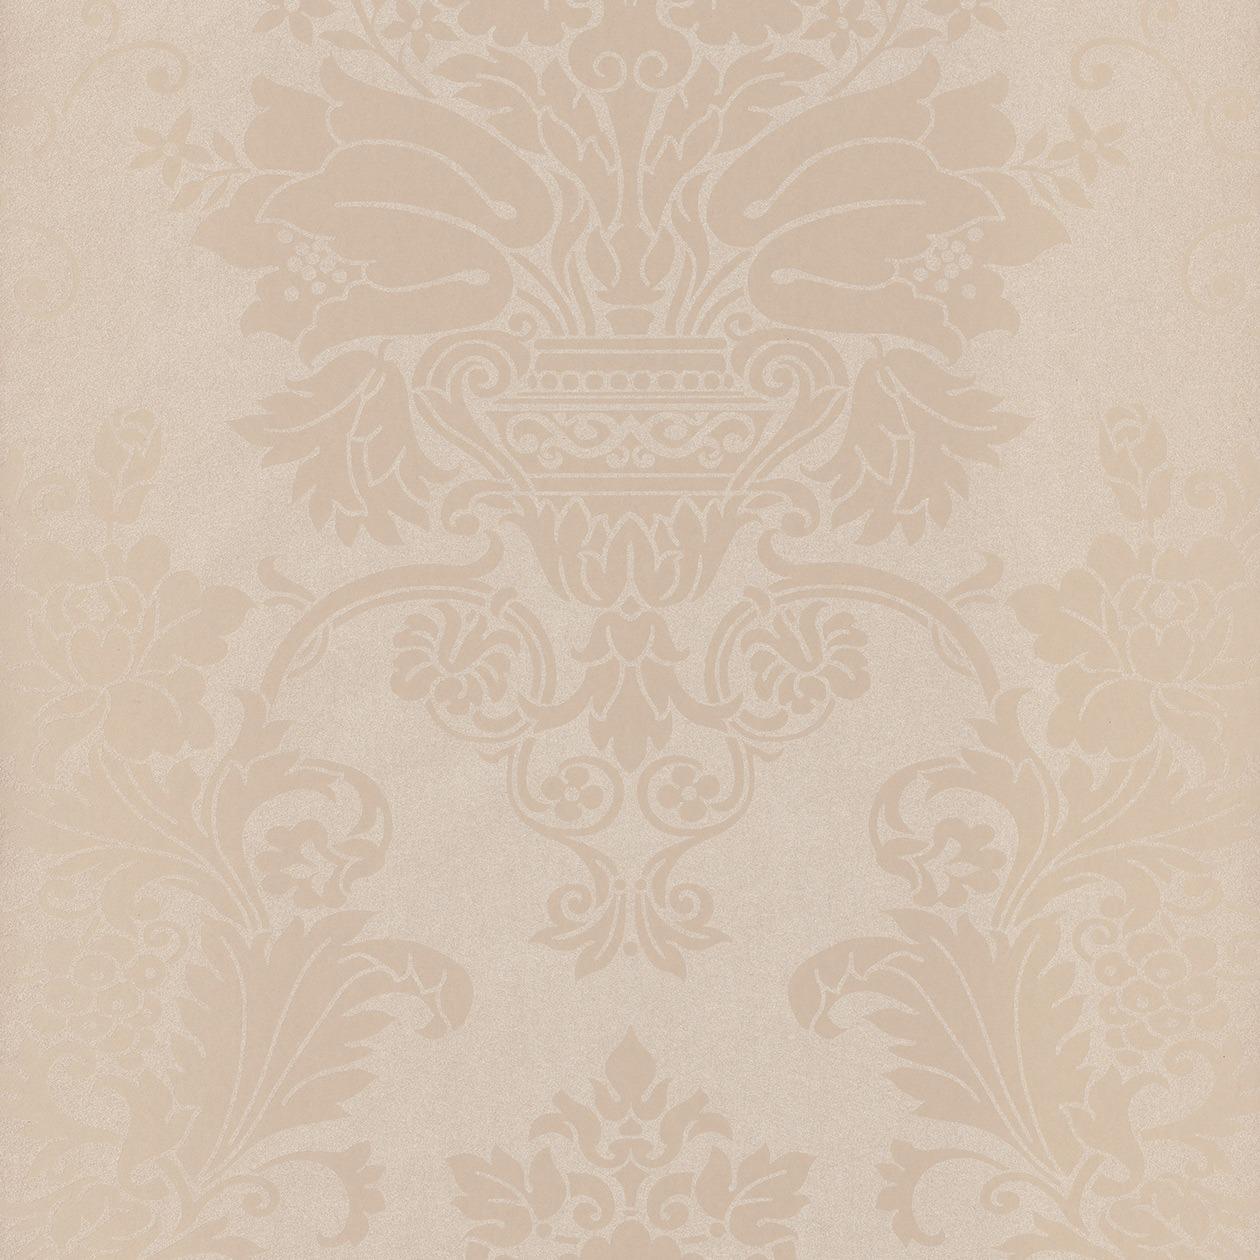 Французские обои Caselio,  коллекция Trio, артикулTIO68071285